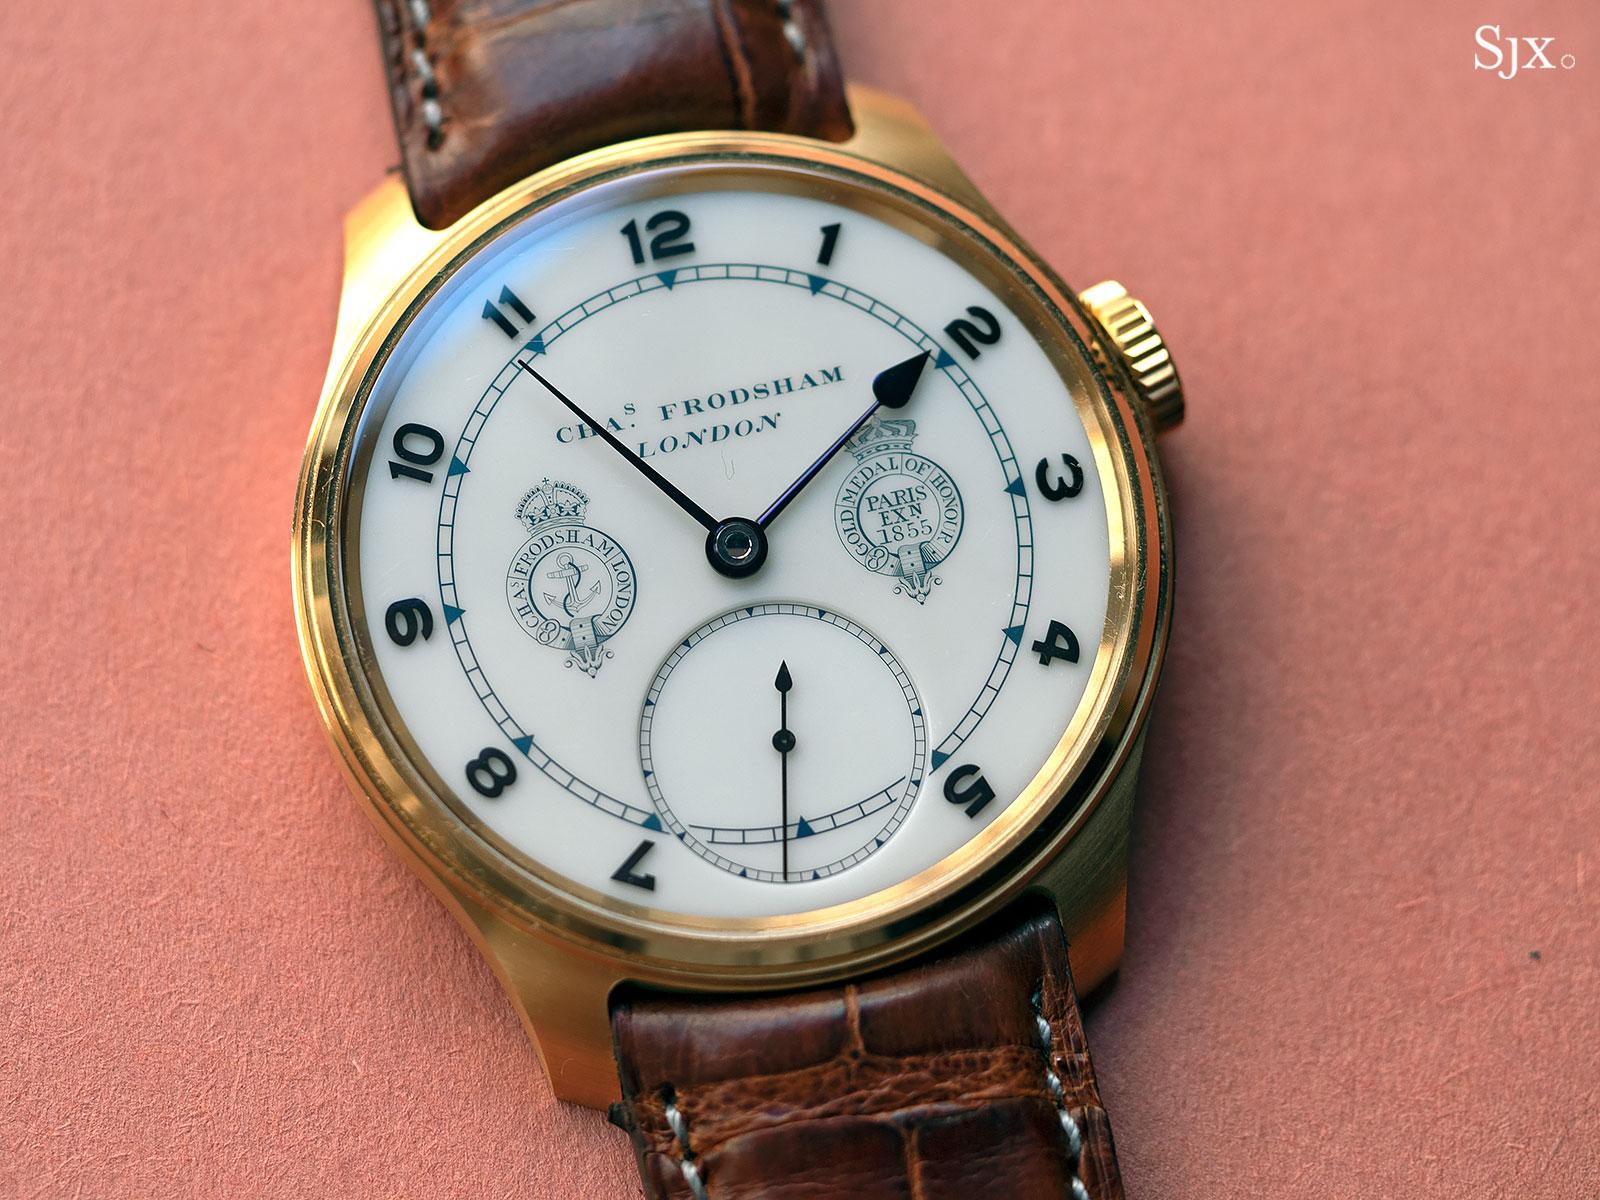 Frodsham Double Impulse chronometer Cyphers 1